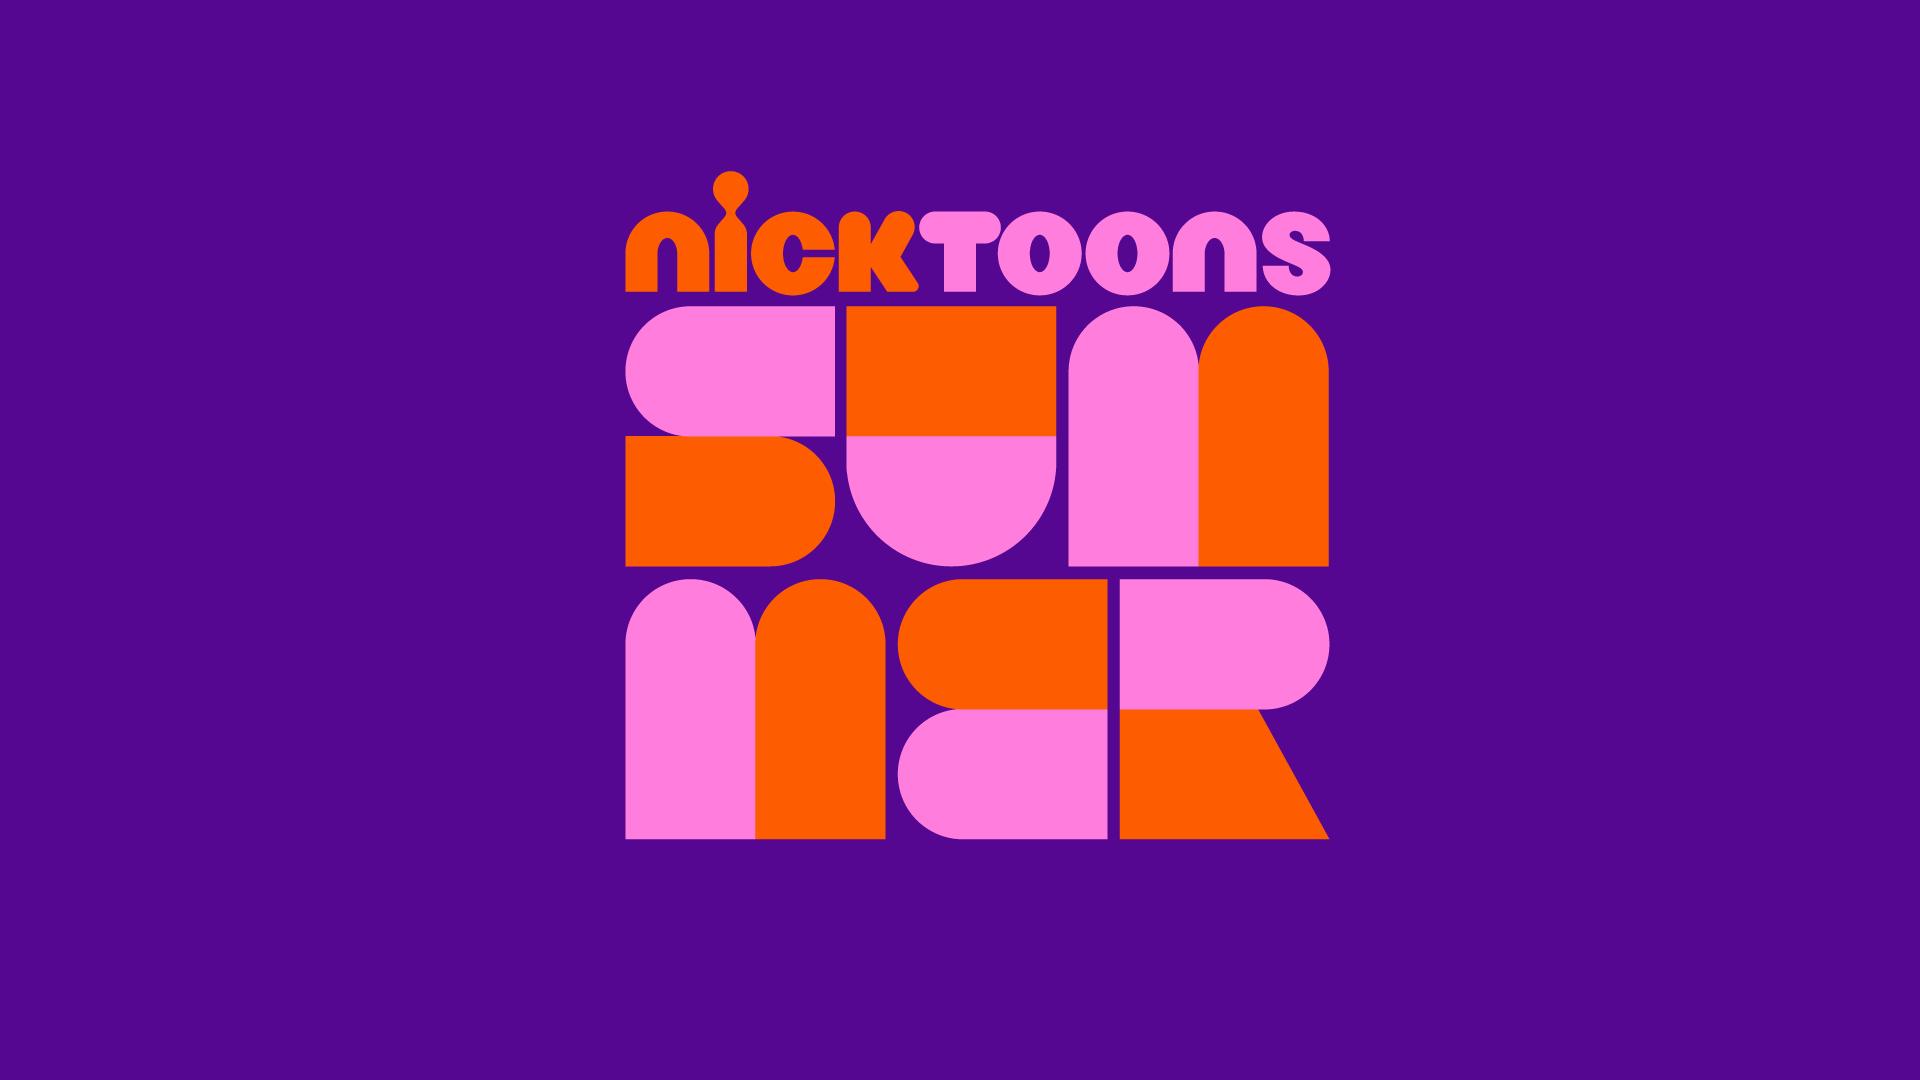 Nicktoons_Summer_Process_Justin-Harder_02.png